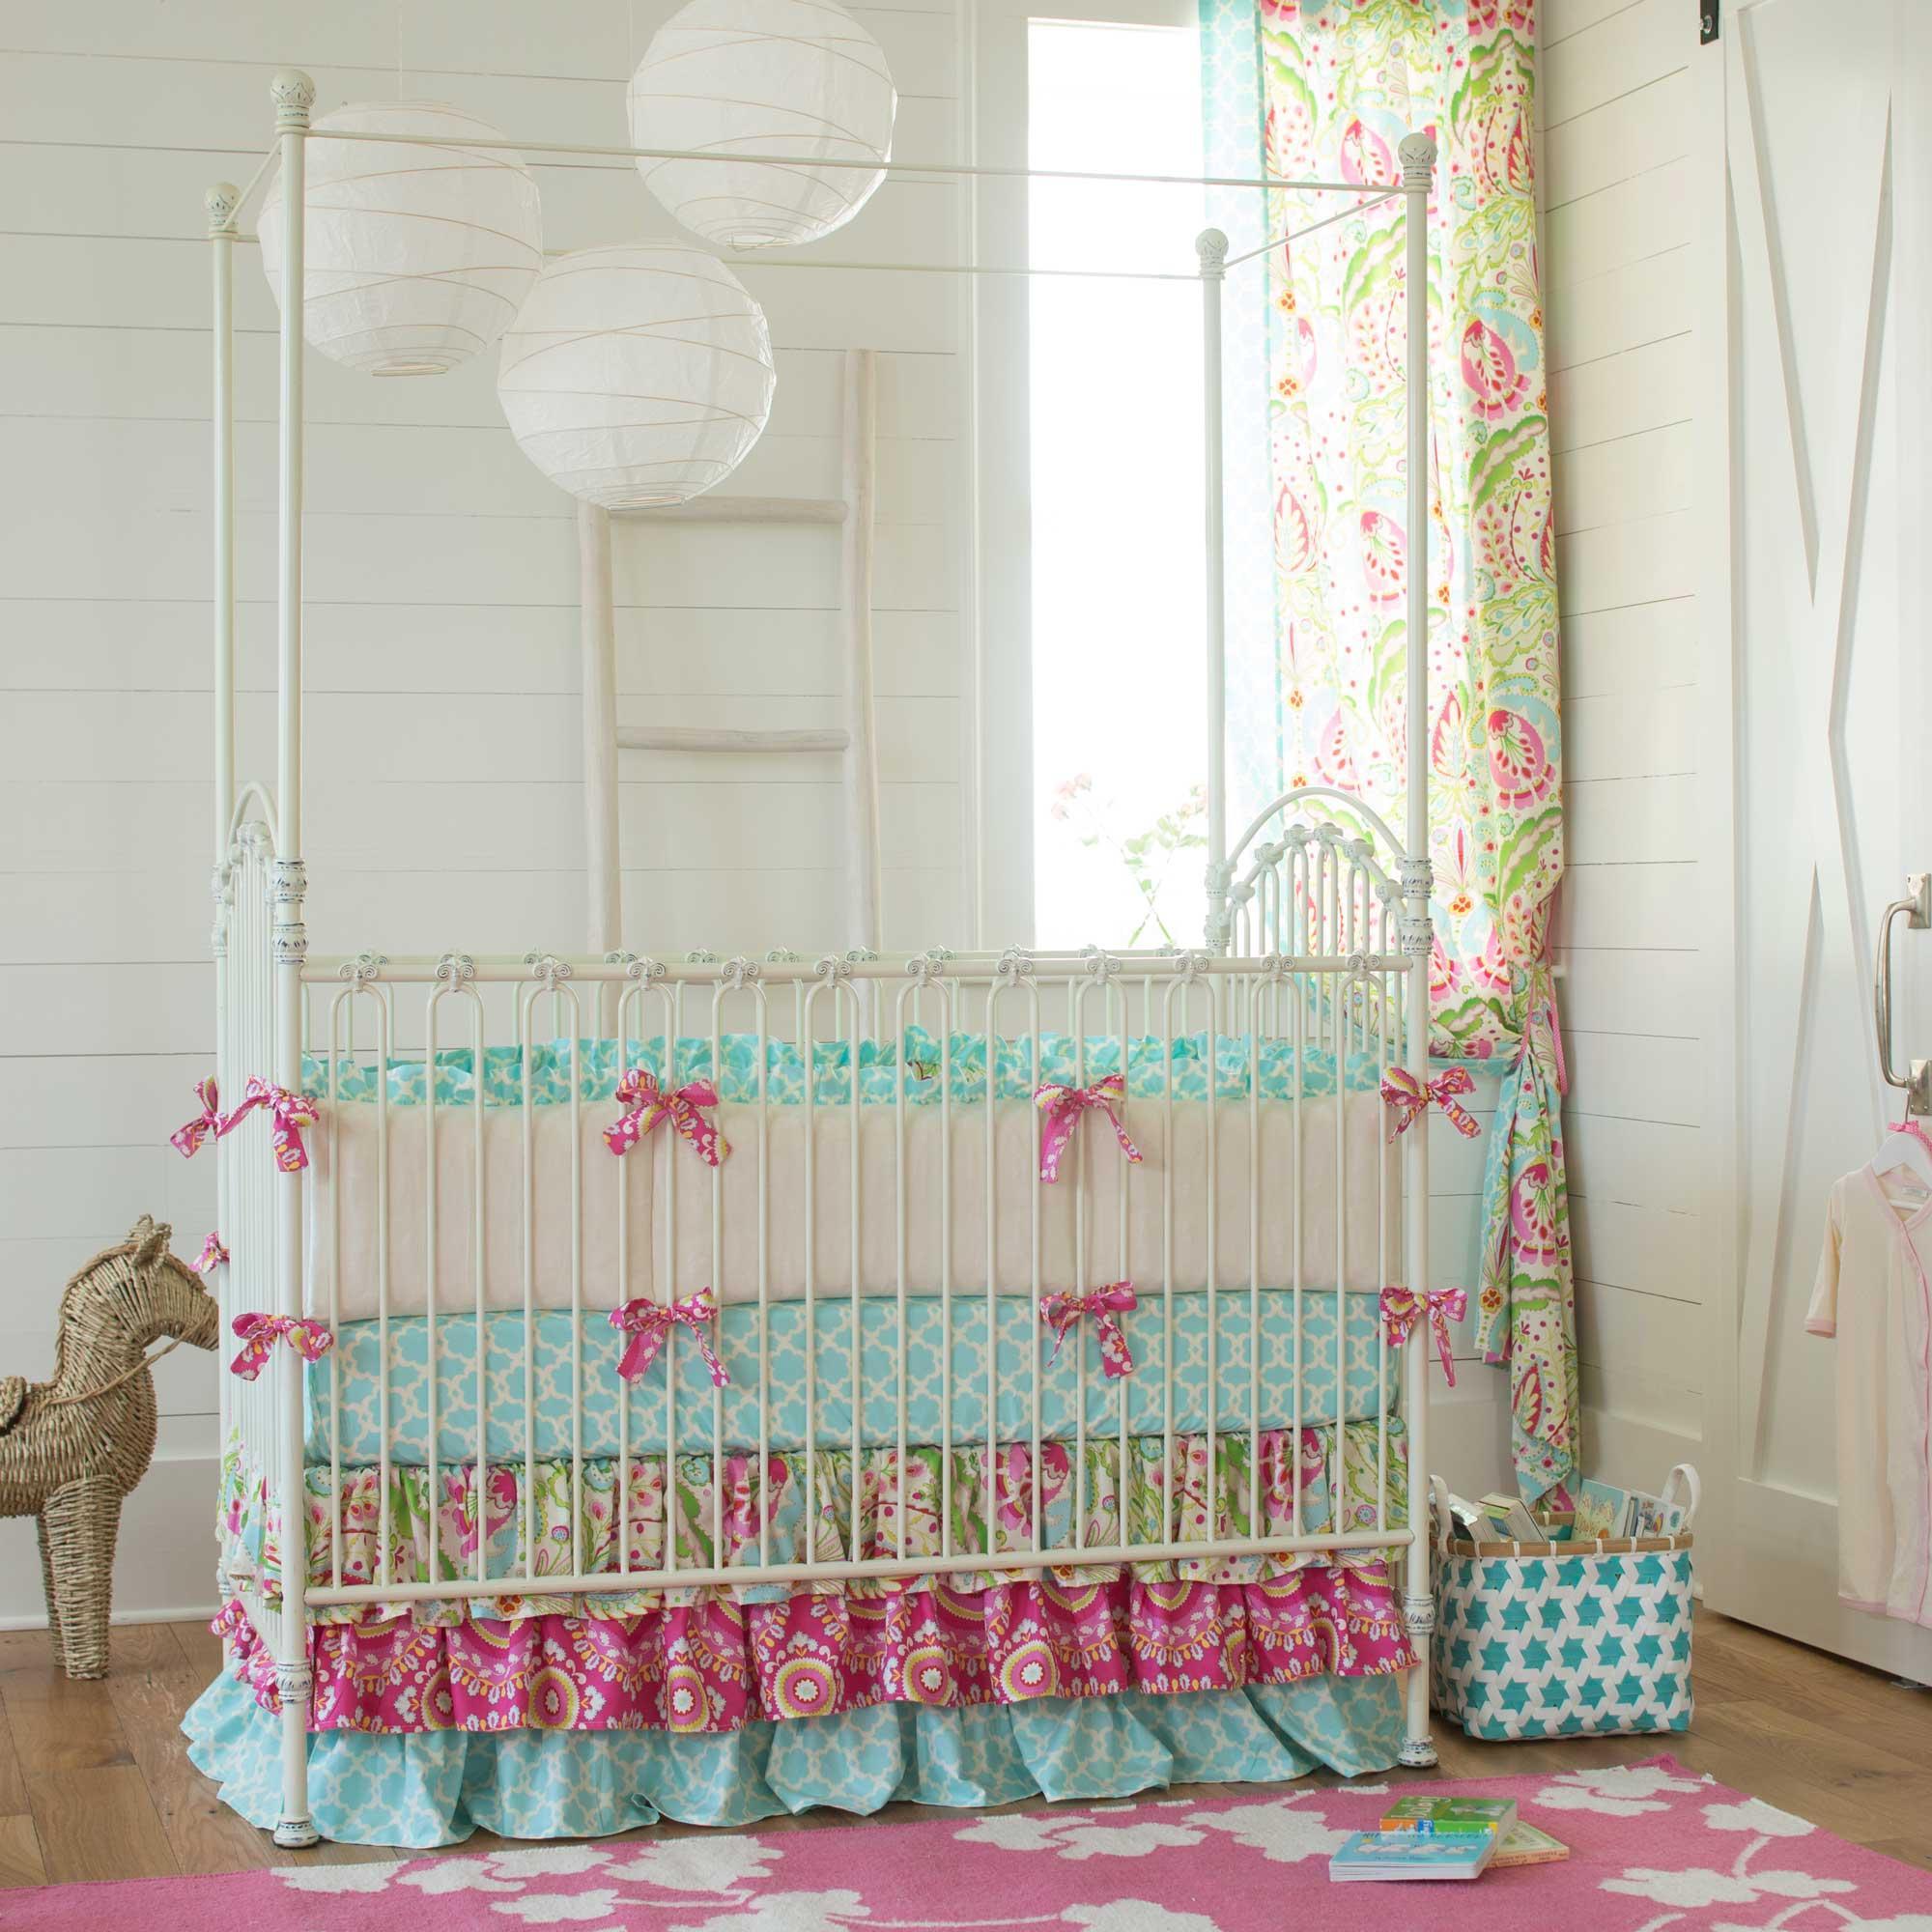 baby bedding kumari garden baby crib bedding FXKHMQM